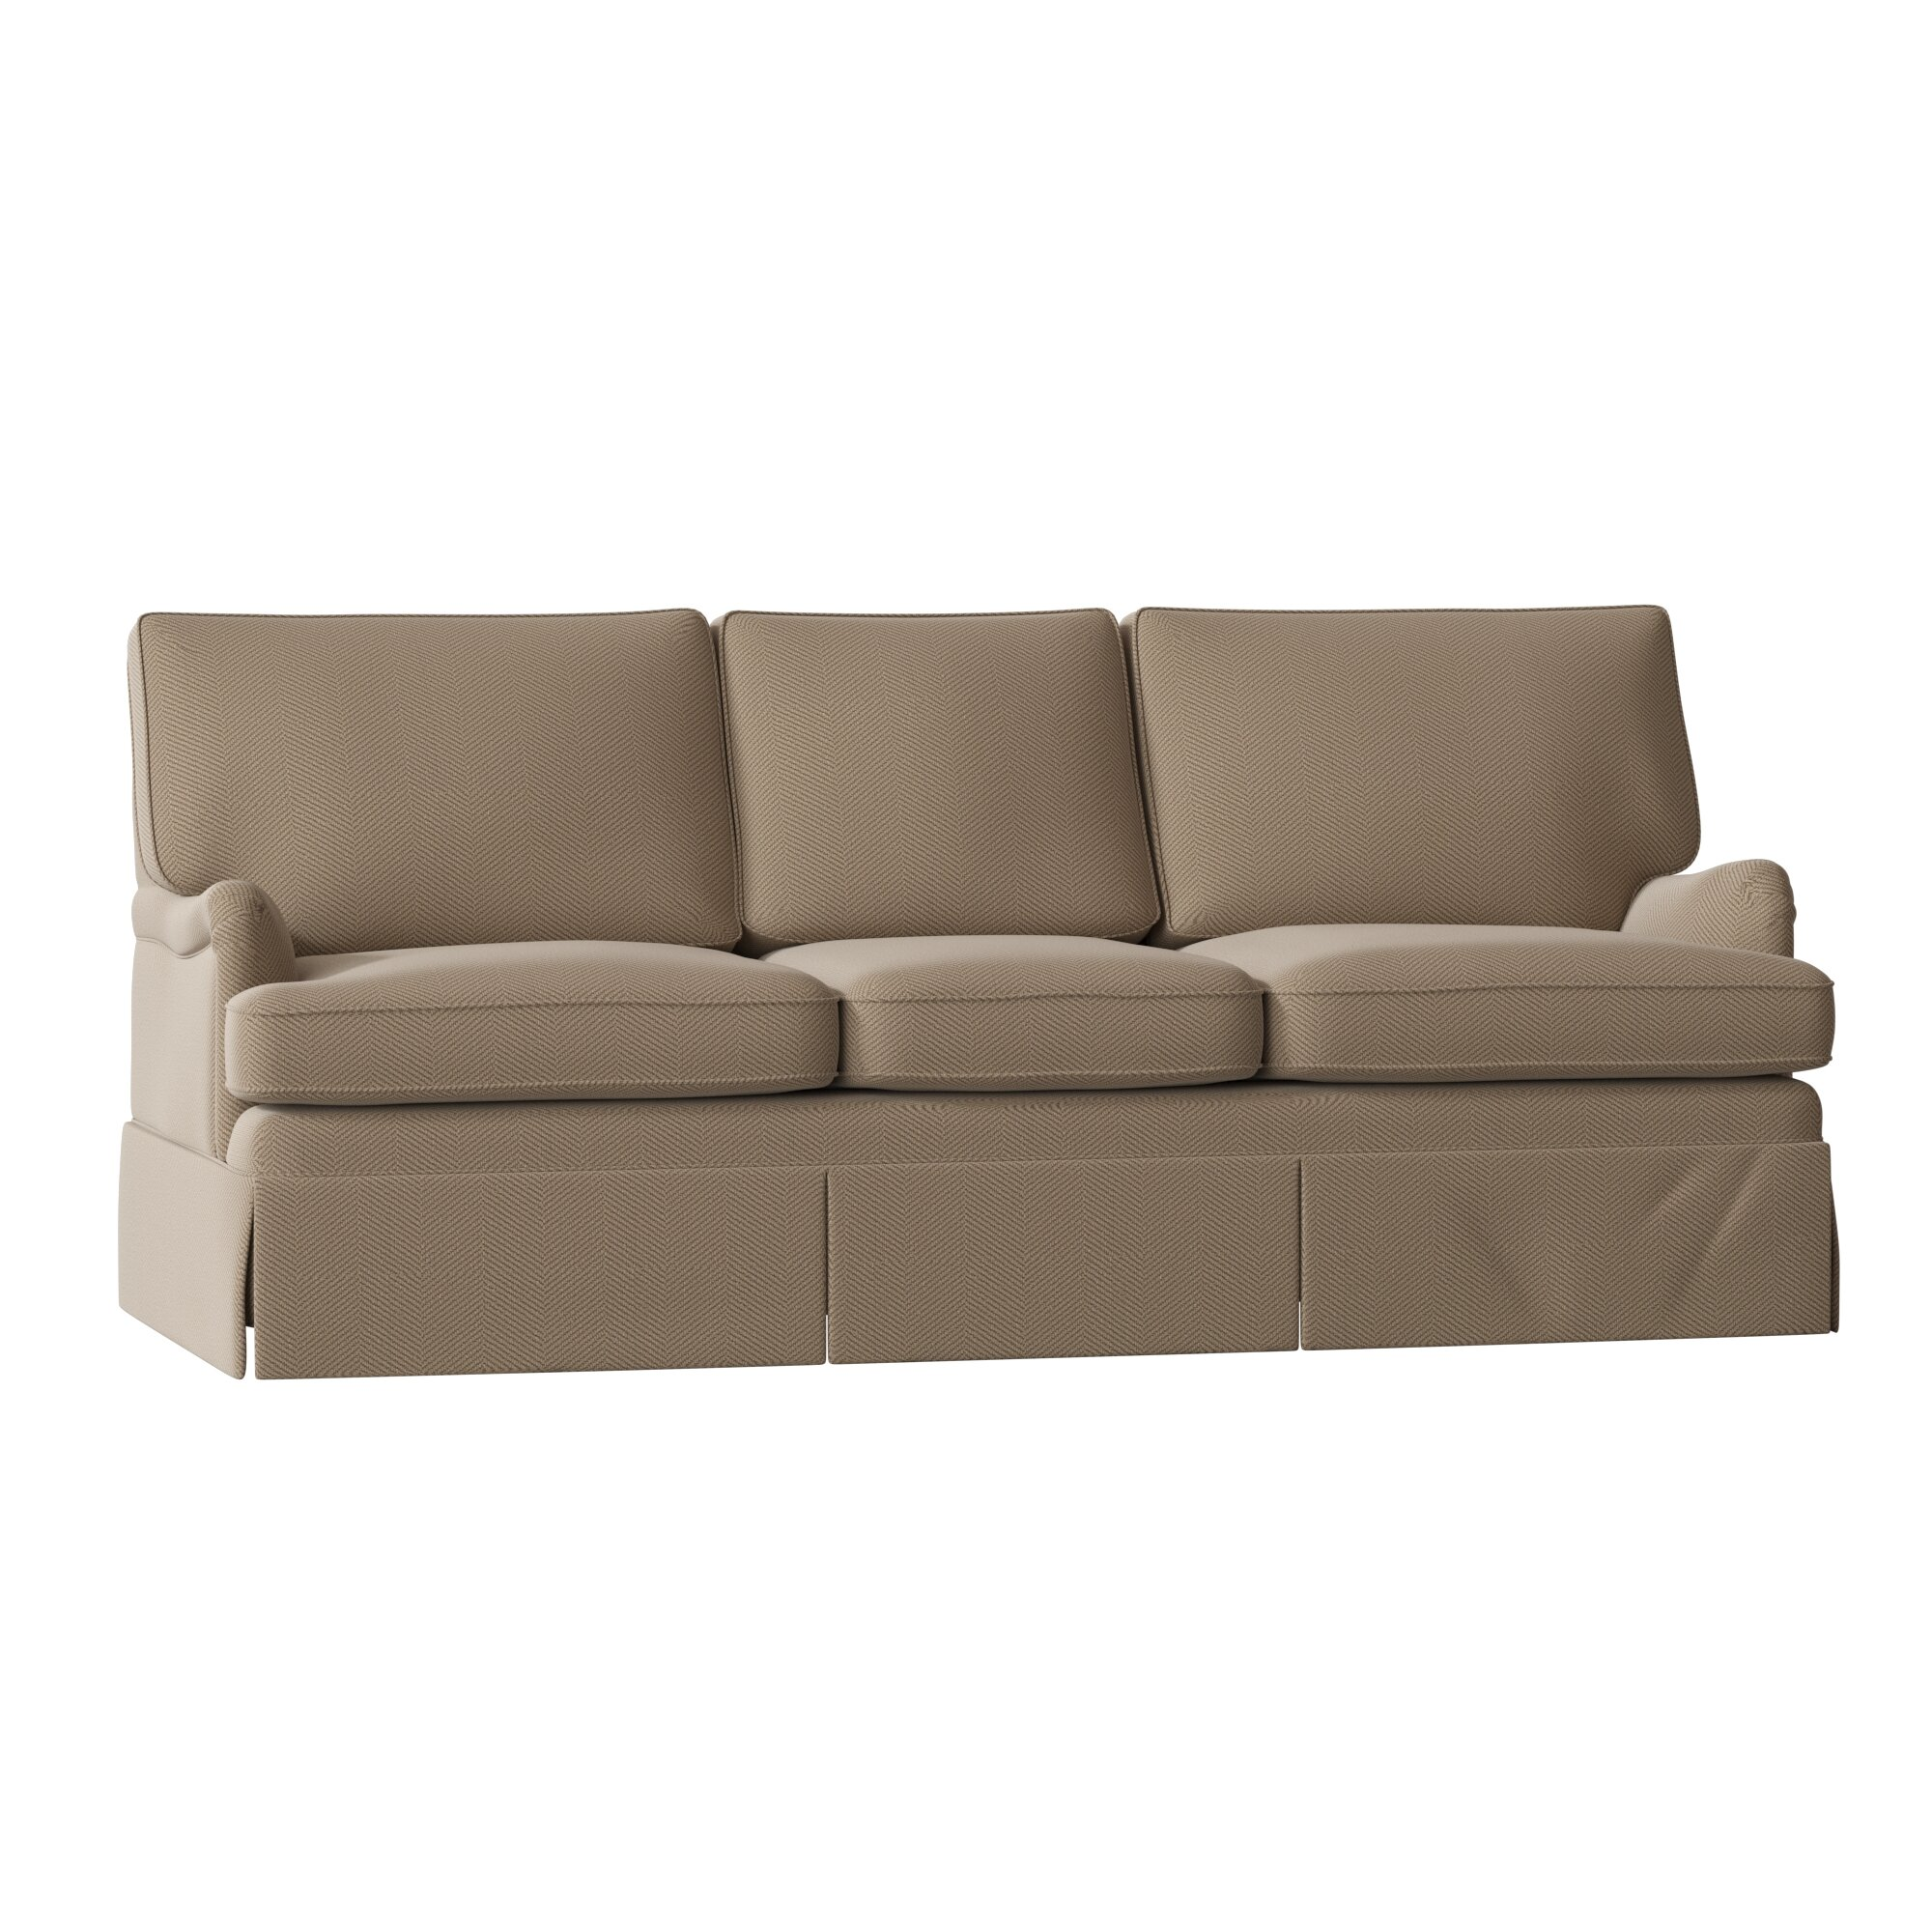 Pleasant London Sleeper Sofa Machost Co Dining Chair Design Ideas Machostcouk